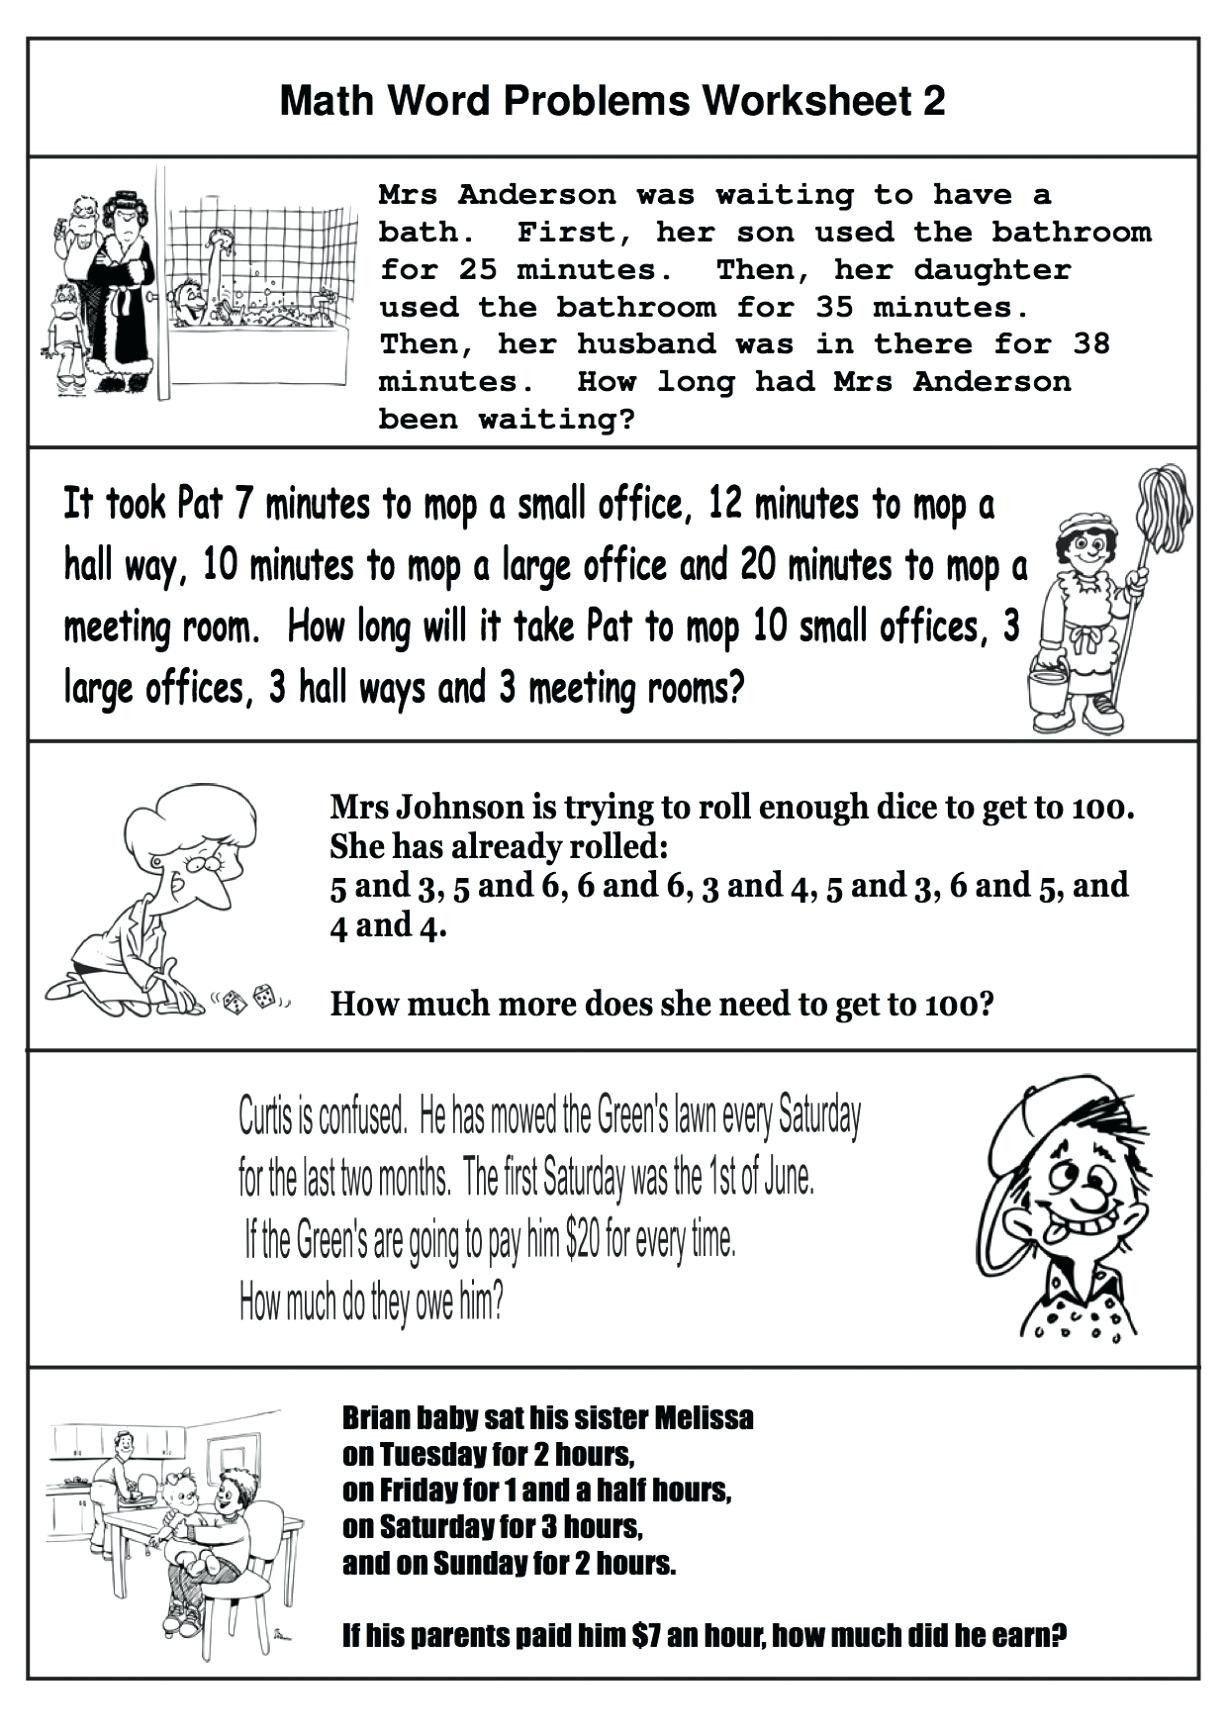 Algebra Word Problems Worksheet Pdf 4 Free Math Worksheets Third Grade 3 Addition Word Problems